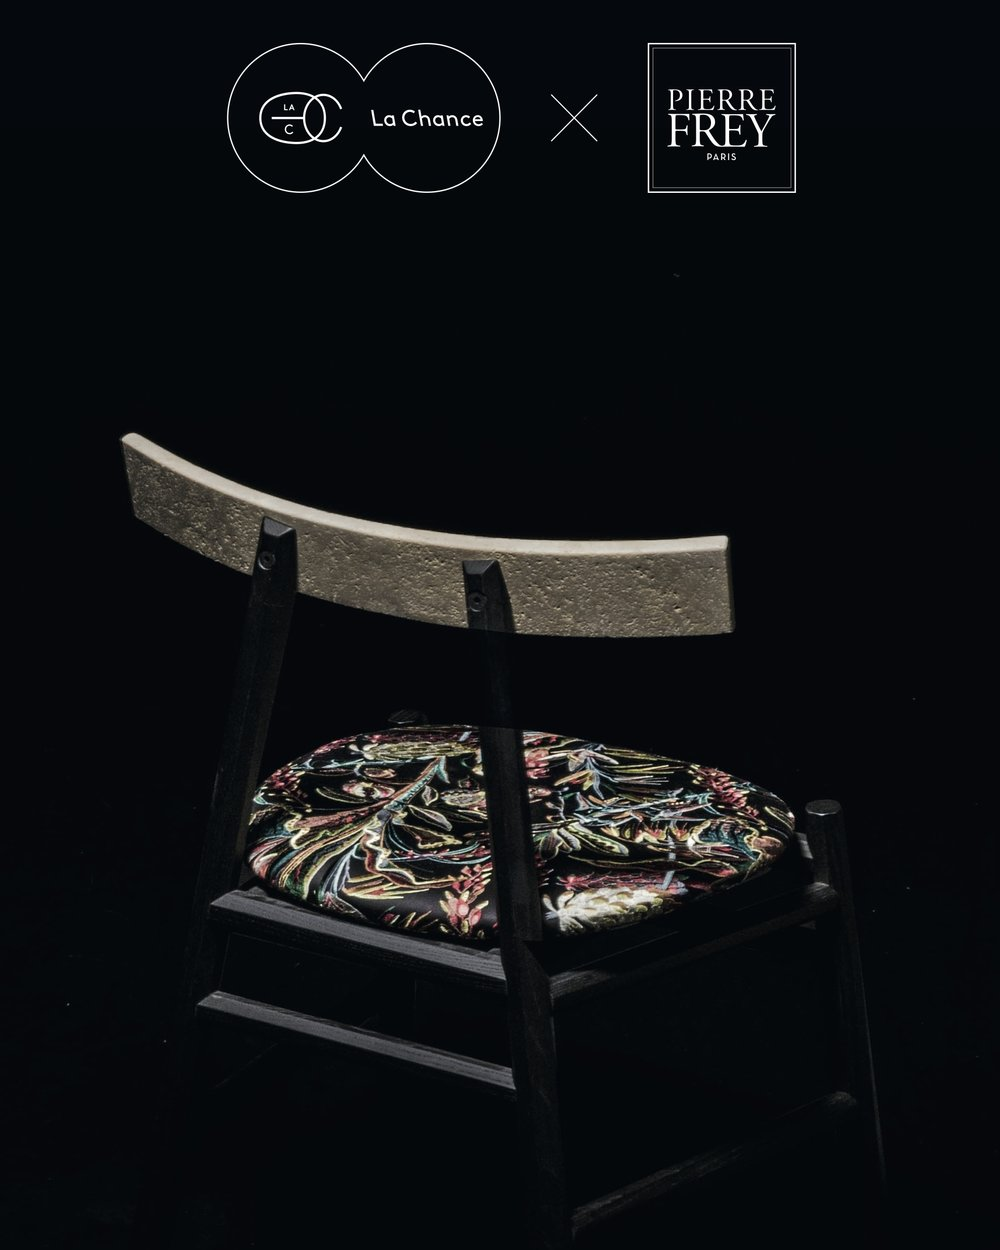 Ronin Chair Galore 2018 - La Chance + Pierre Frey Paris